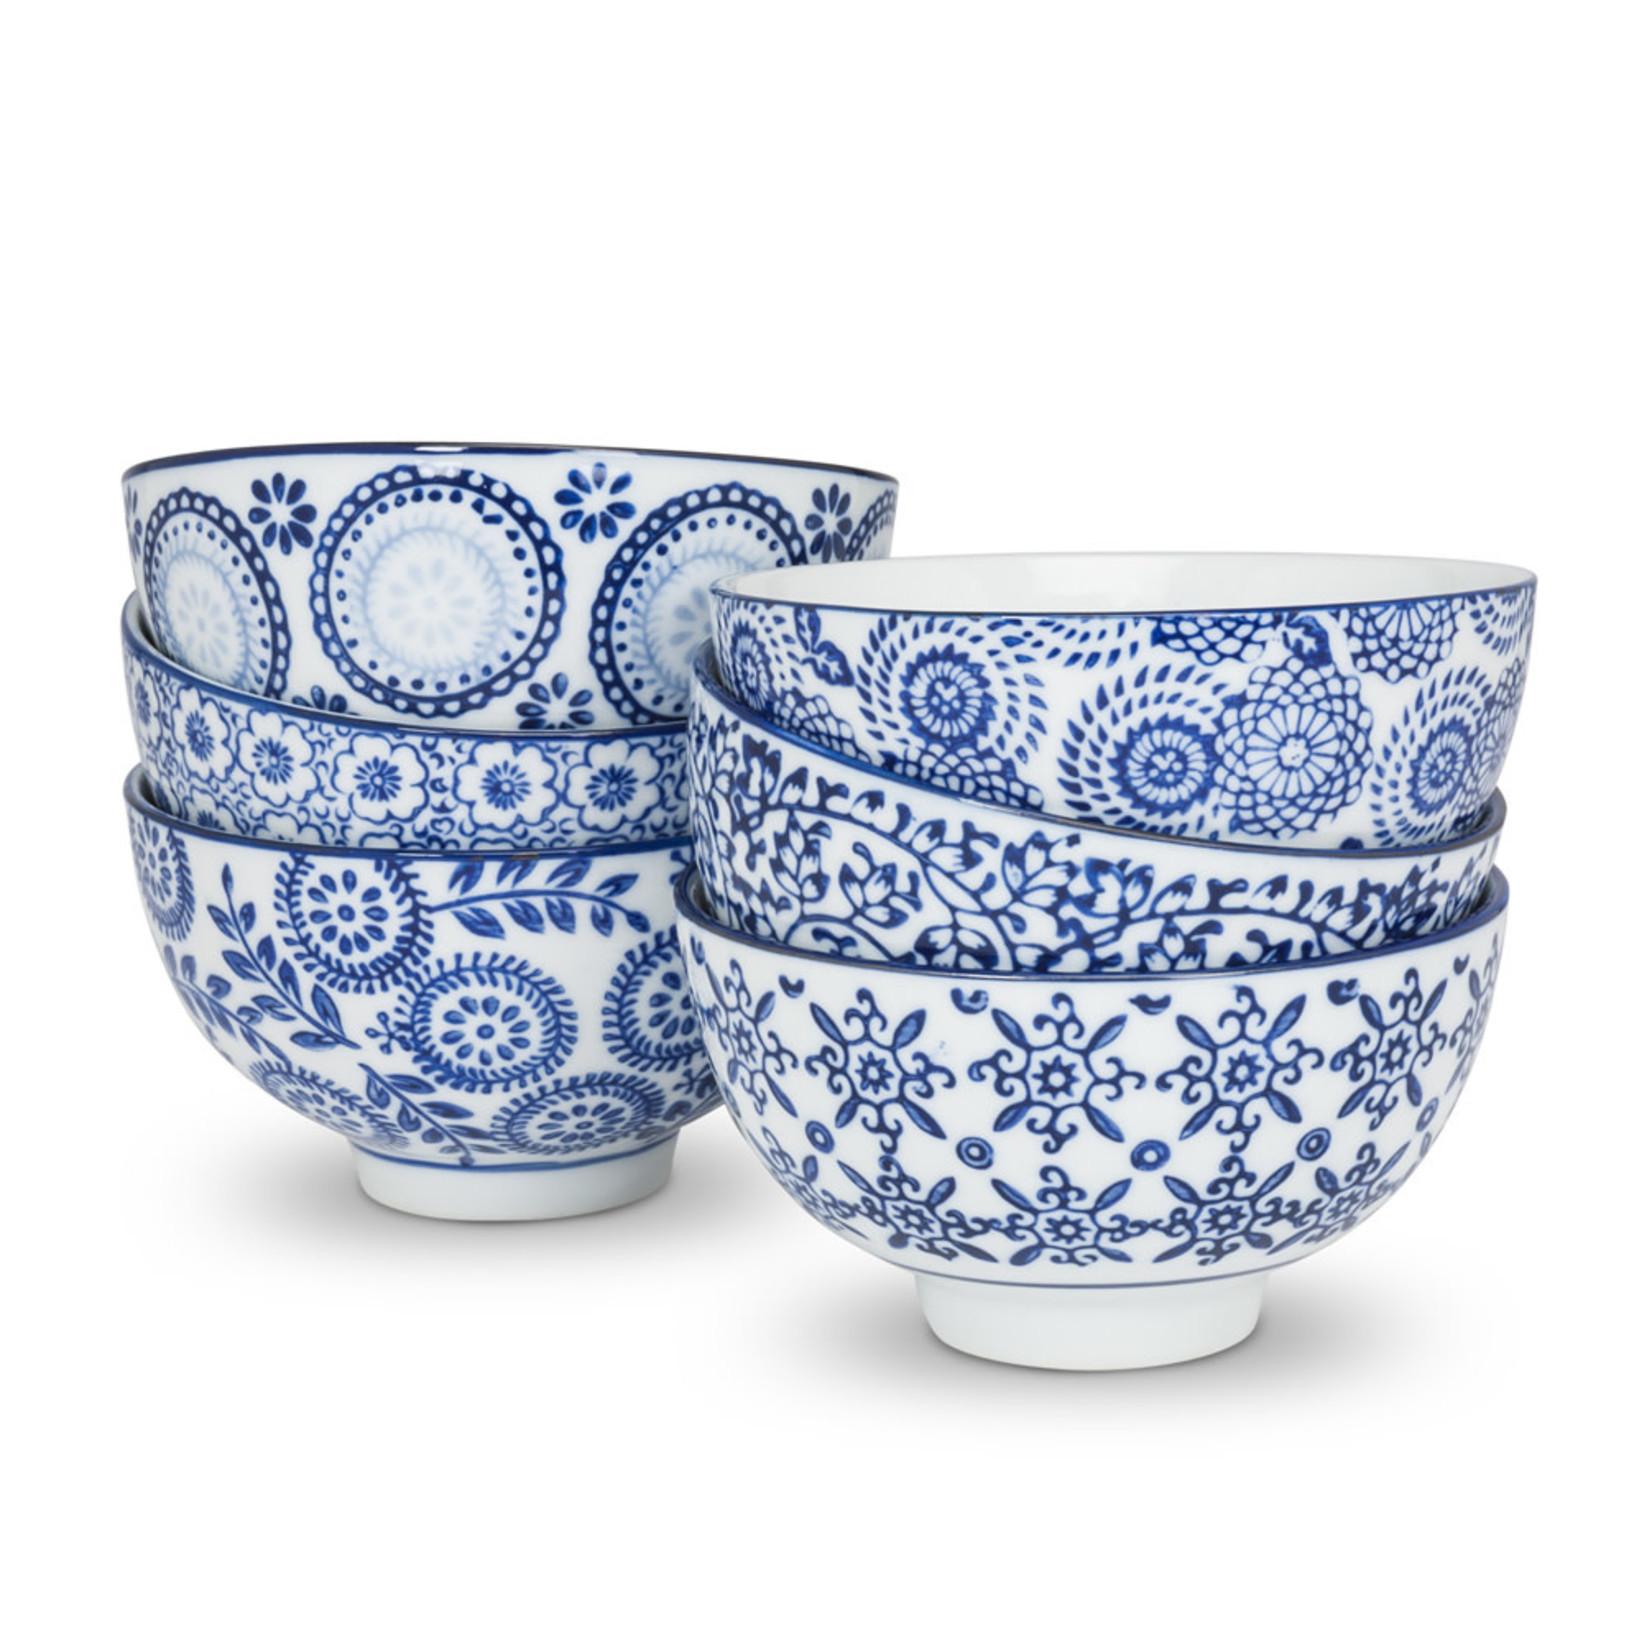 Abbott Bowls